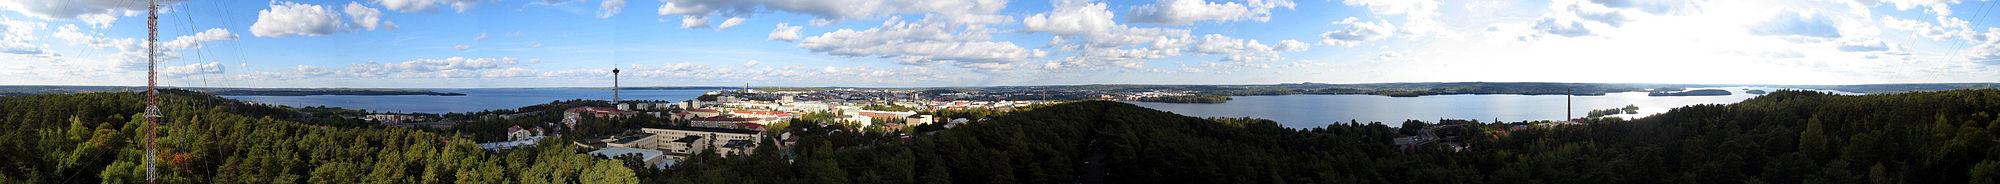 Tampere z věže v Pyynikki